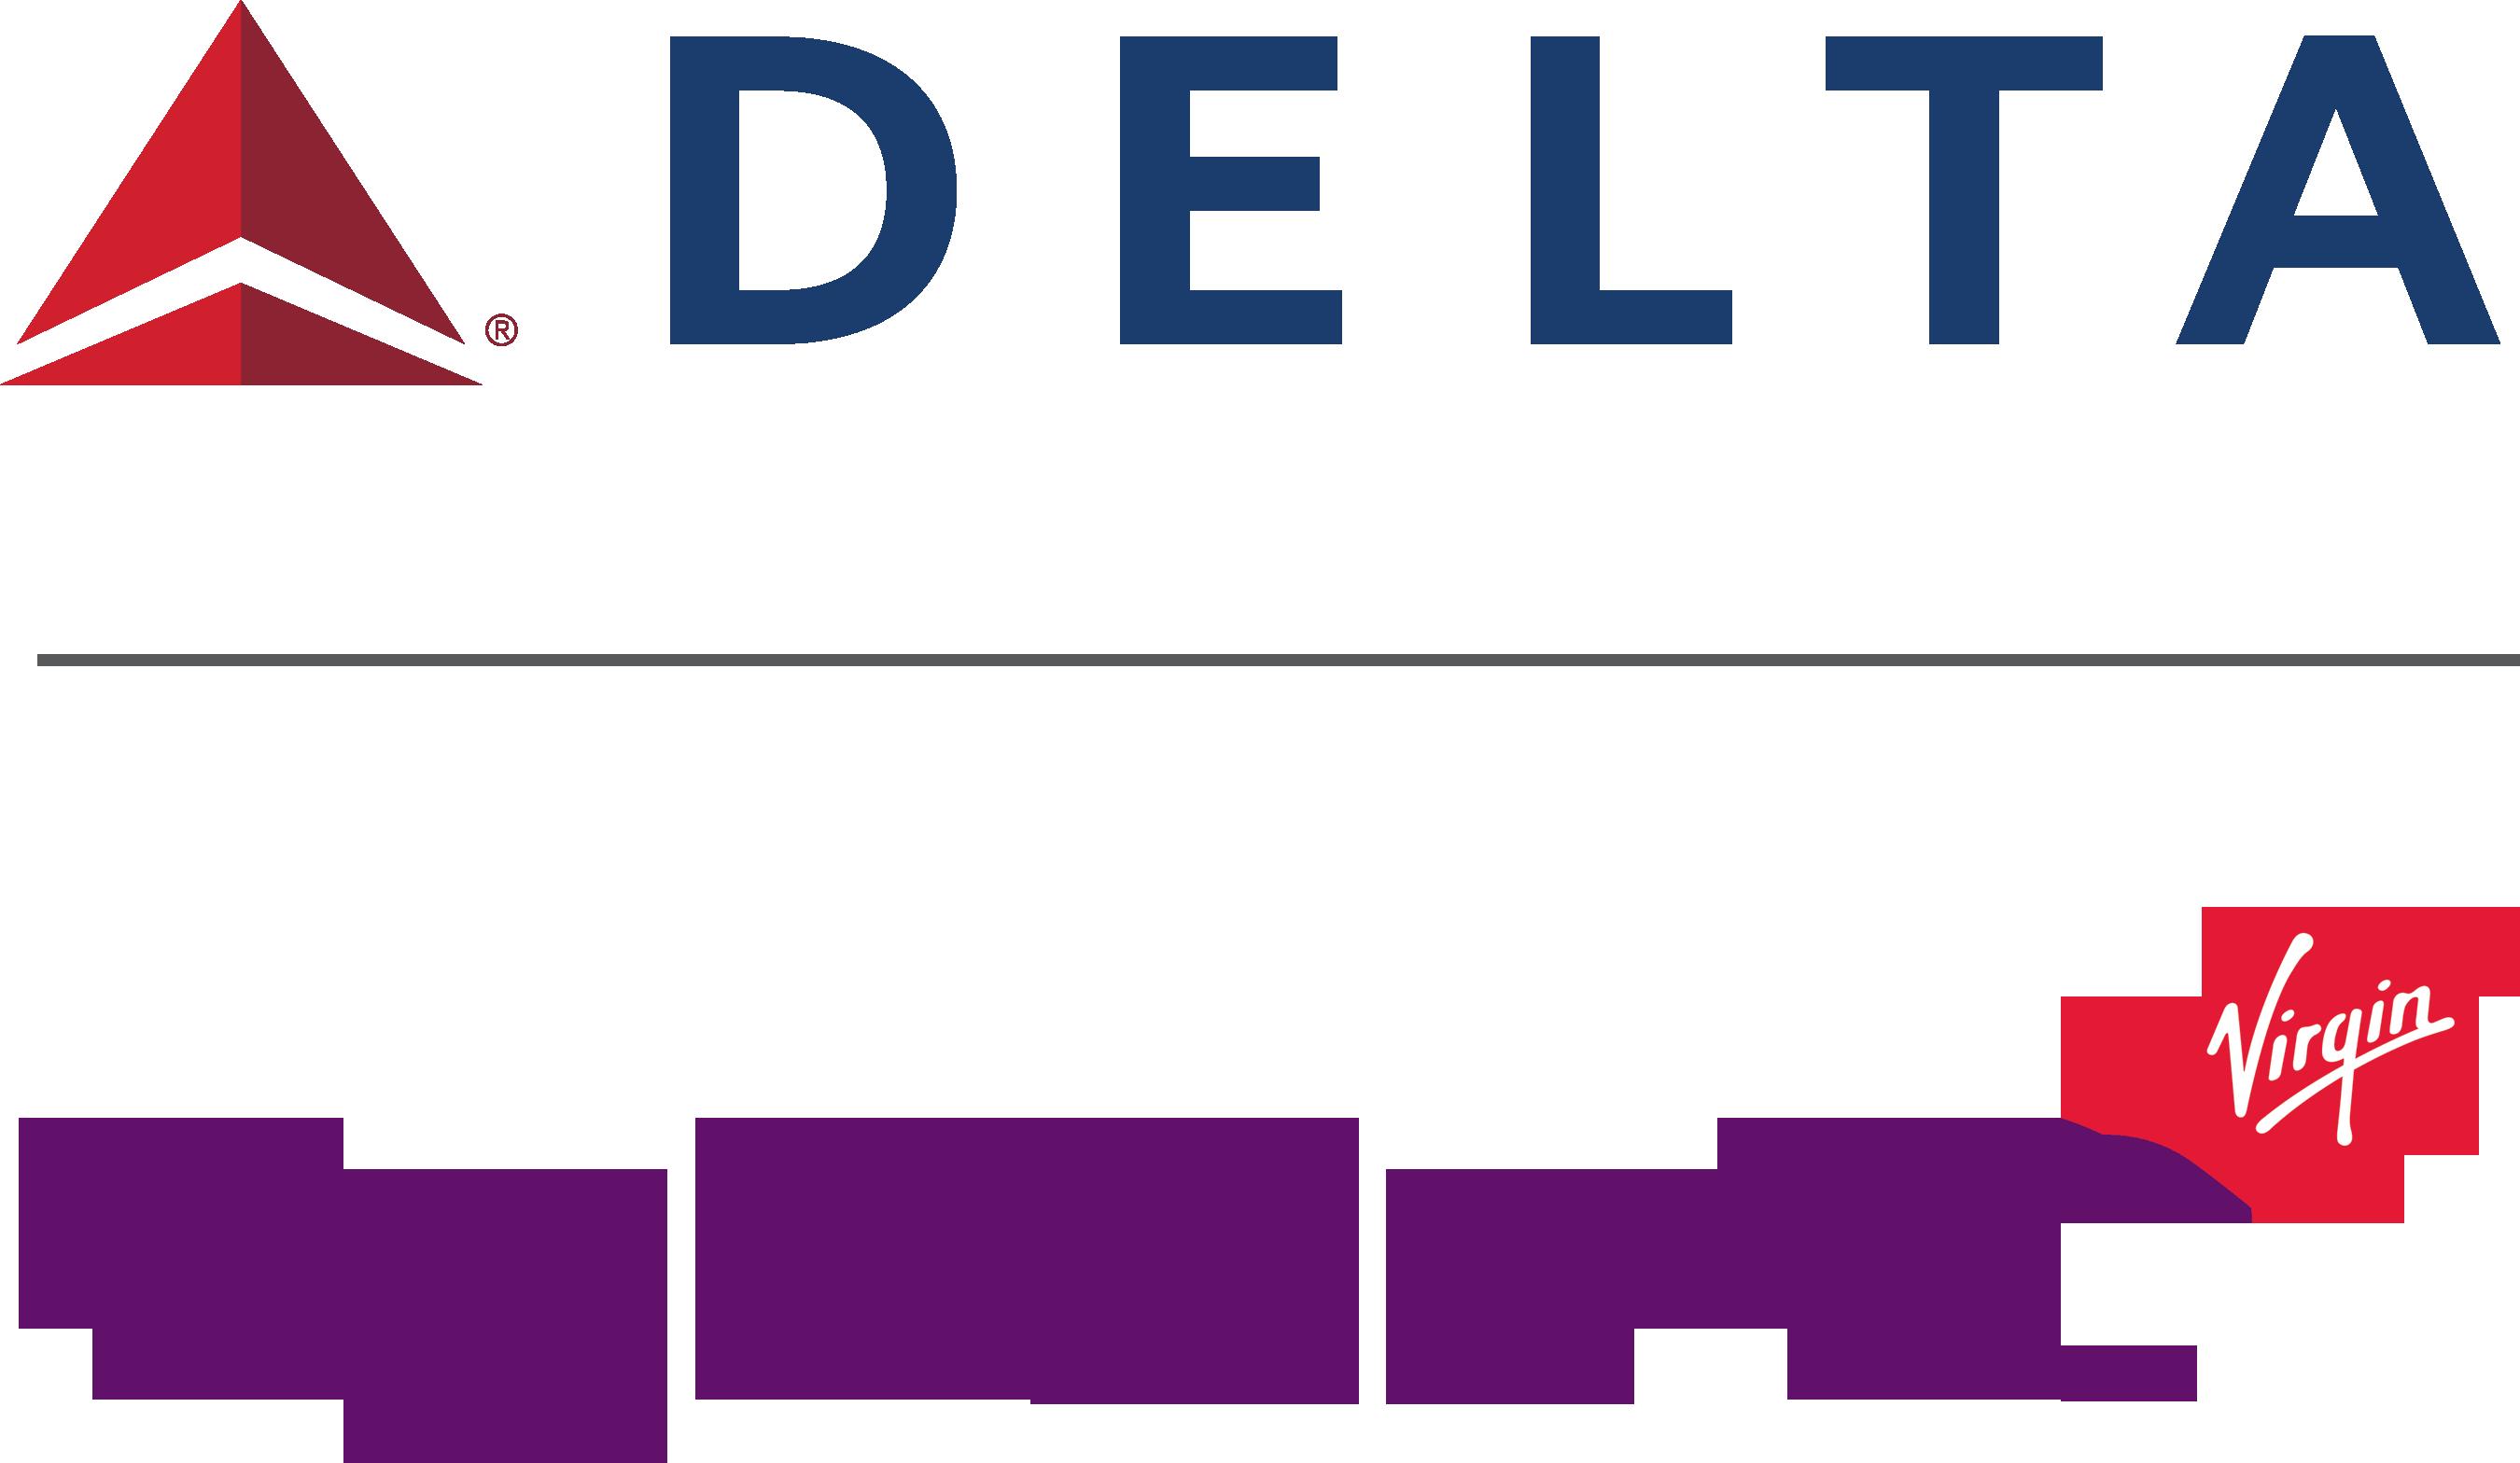 Delta Airline and Virgin Atlantic